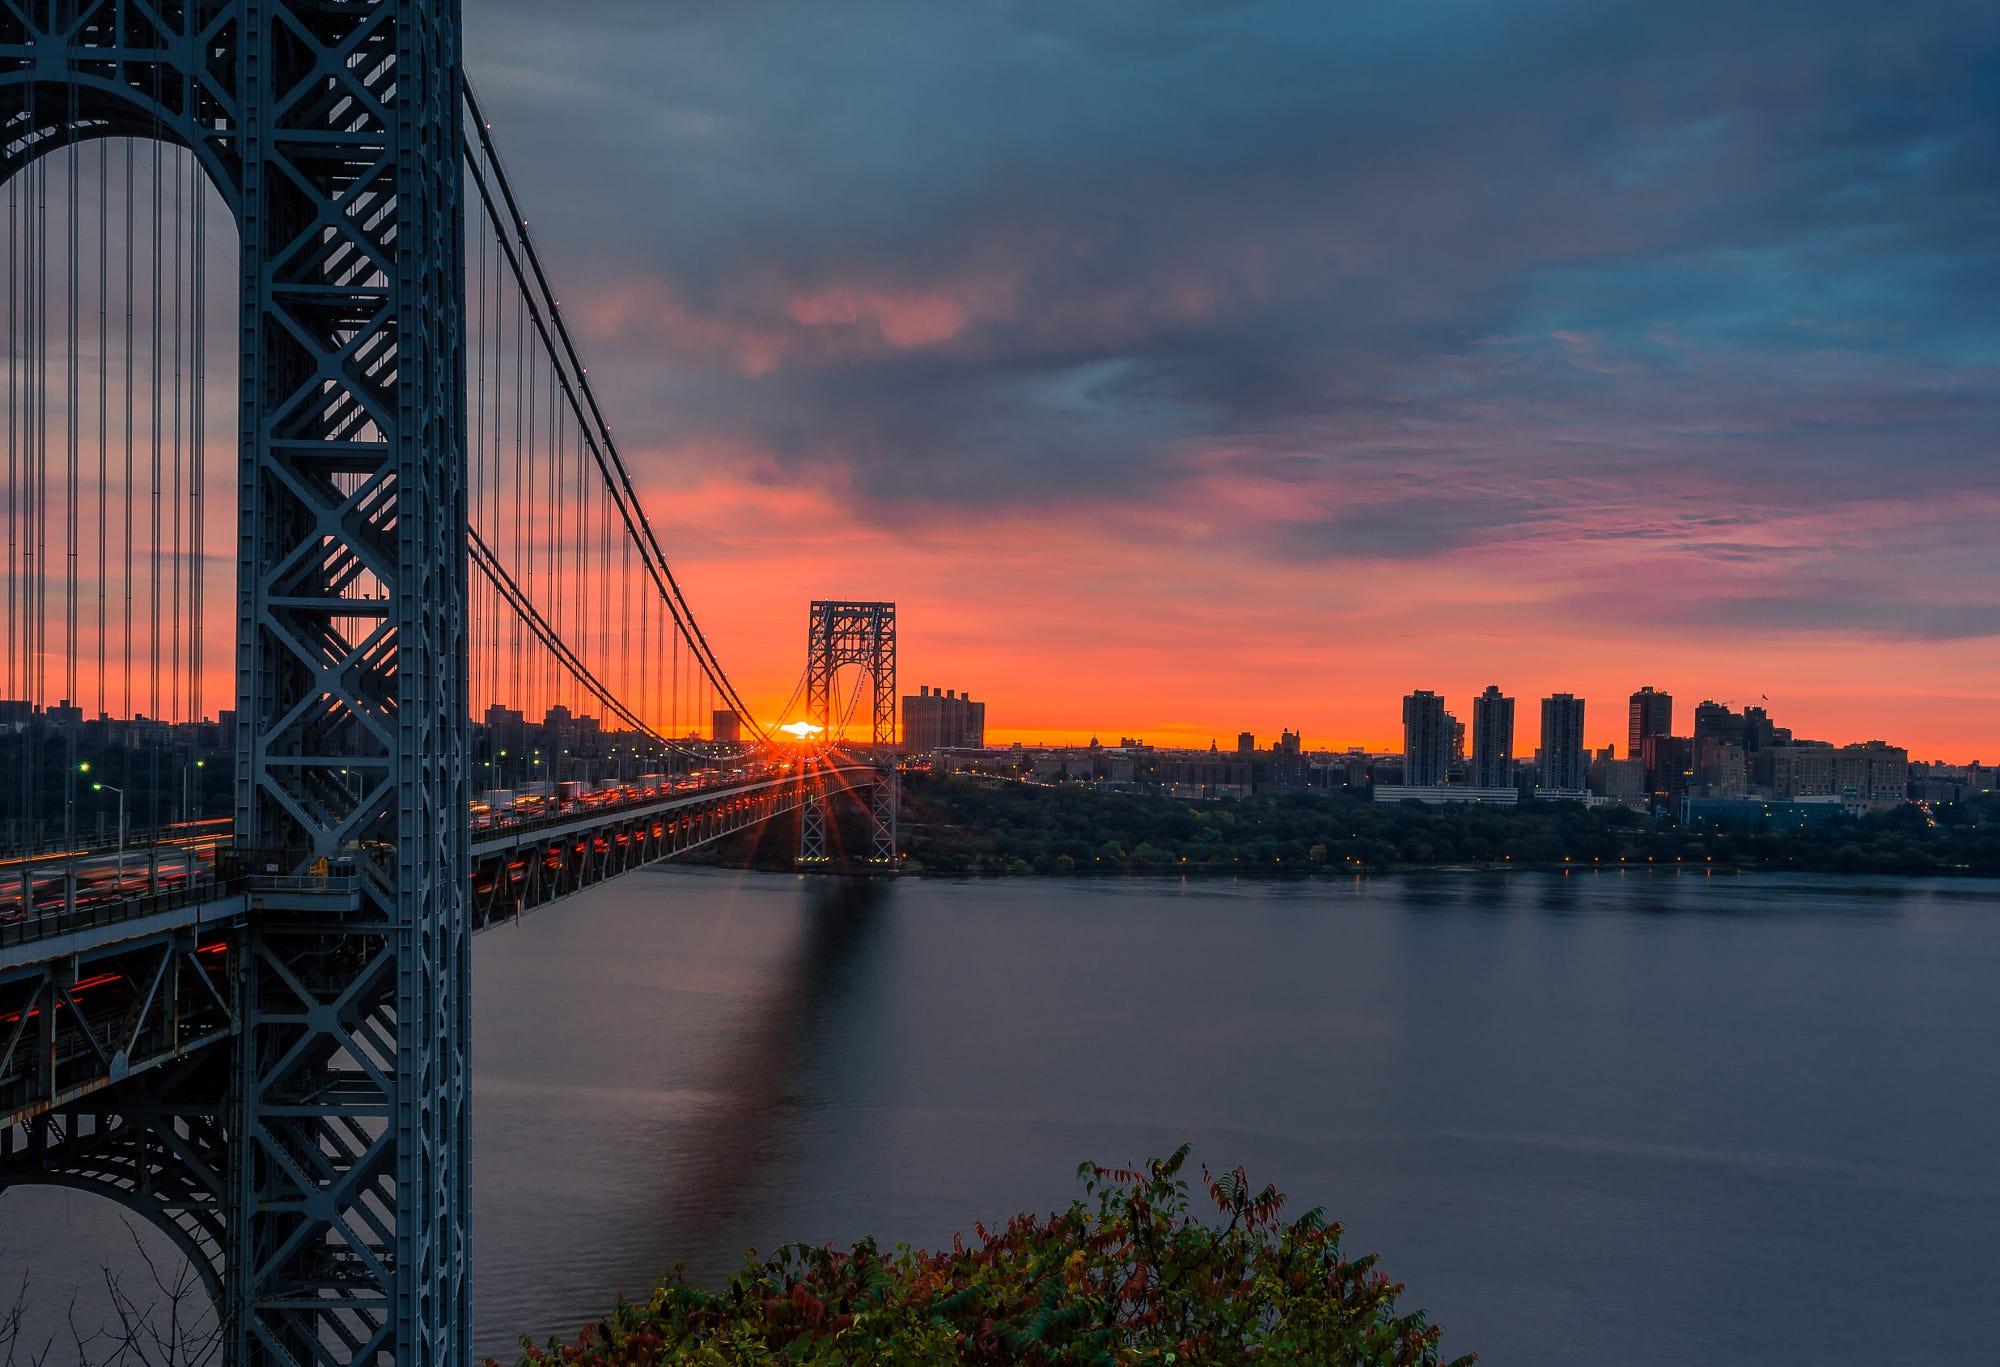 7 George Washington Bridge HD Wallpapers Background Images 2000x1367